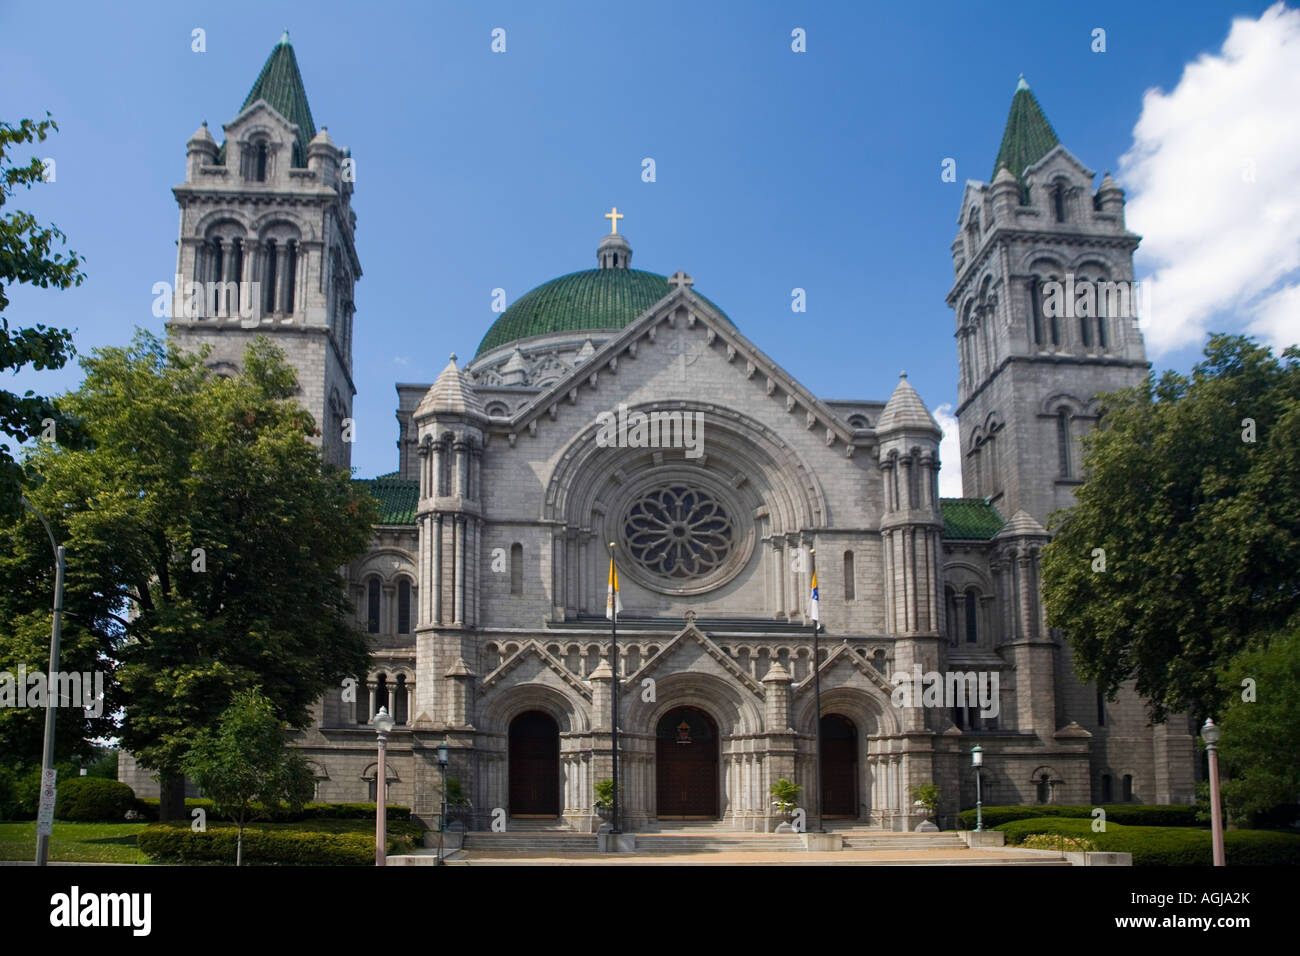 Cathedral Basilica of Saint Louis, Missouri - Stock Image